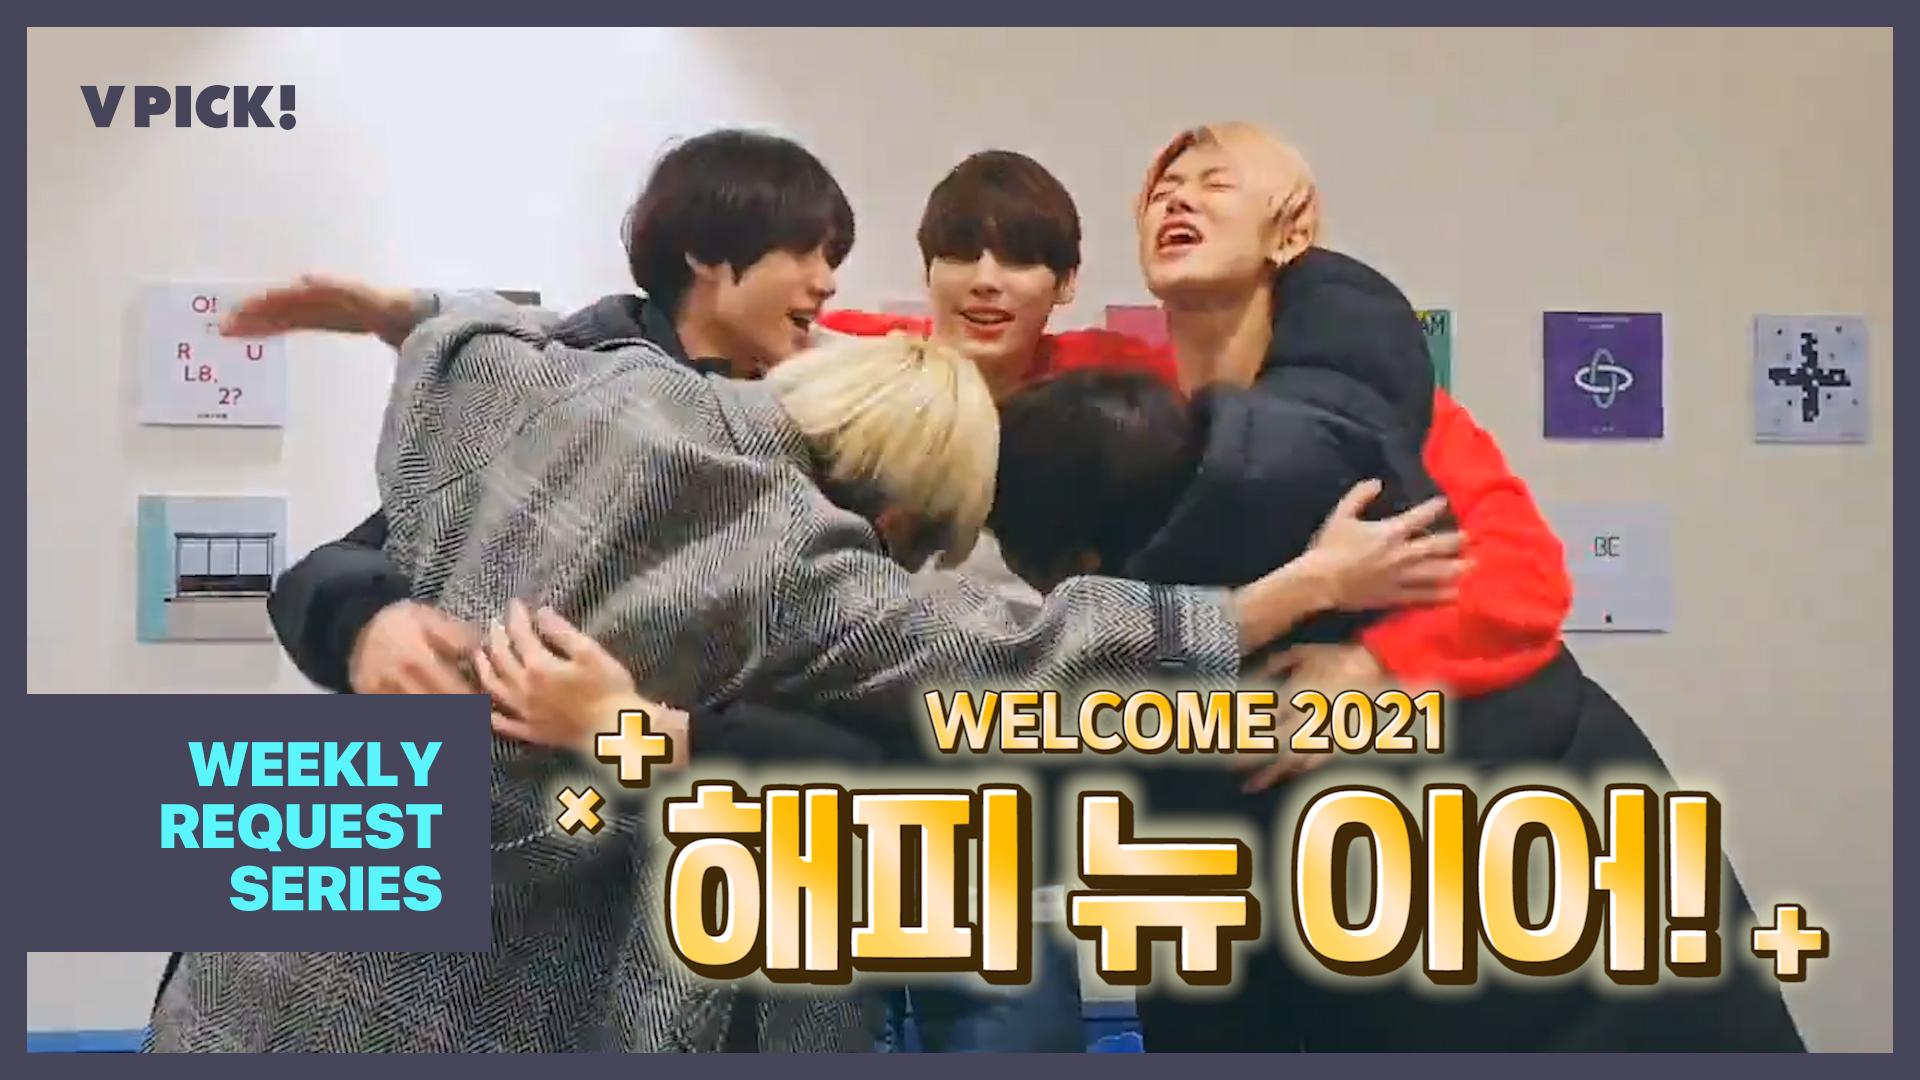 [TXT] 2021 서베이 : 새해에 외친 말 🗳️ 1위 '투바투 사랑해' (TXT celebrating the New Year)